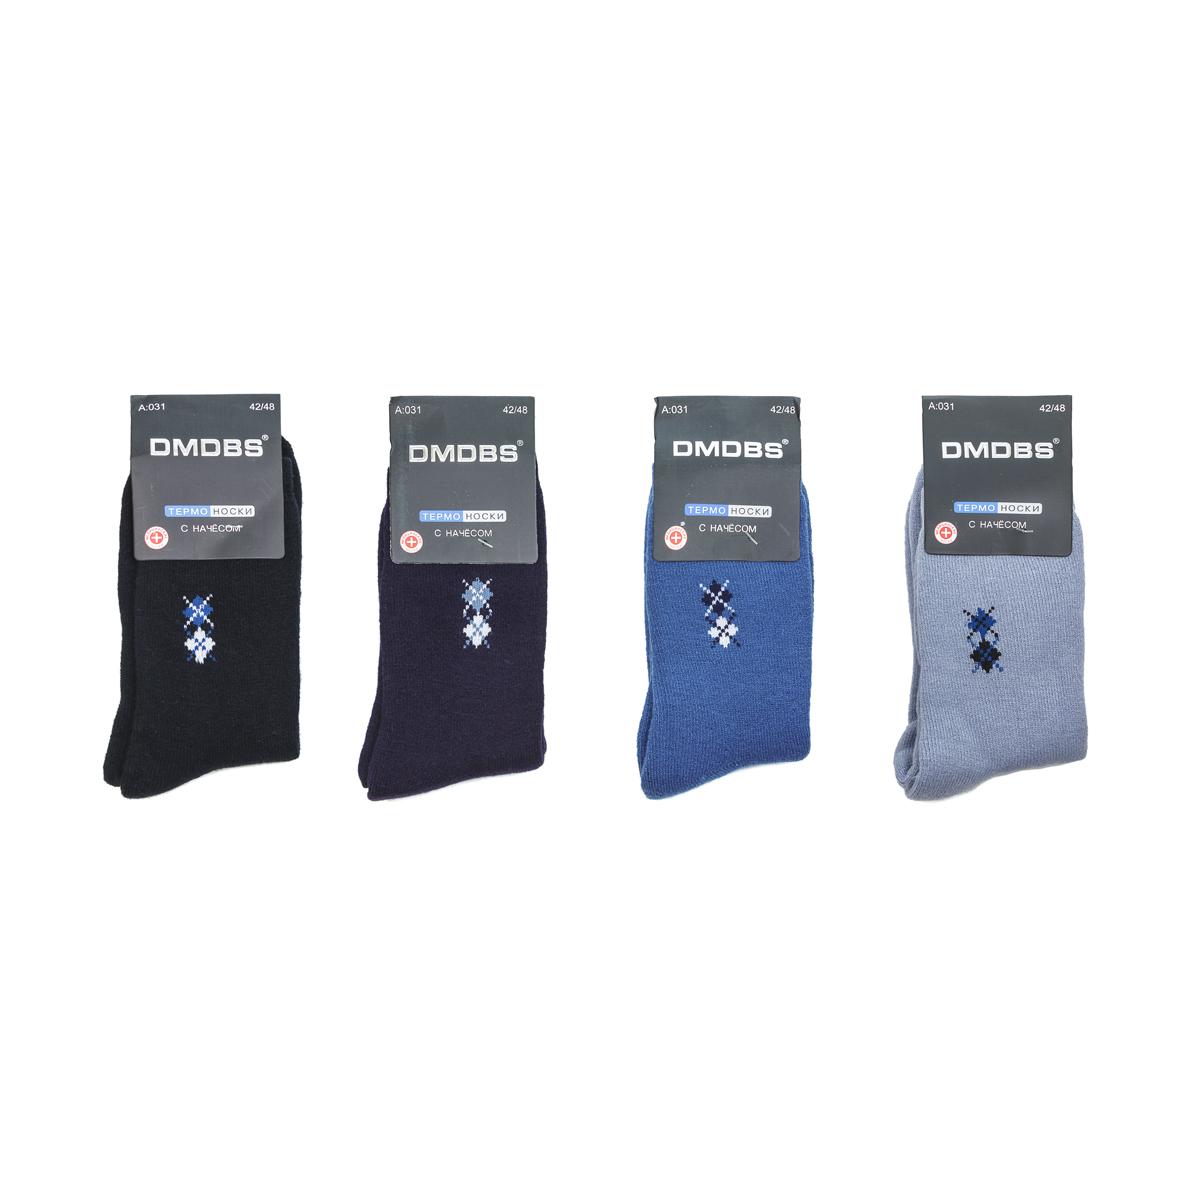 Муж. носки арт. 12-0014 Синий р. 42-48Носки<br><br><br>Тип: Муж. носки<br>Размер: 42-48<br>Материал: Трикотаж